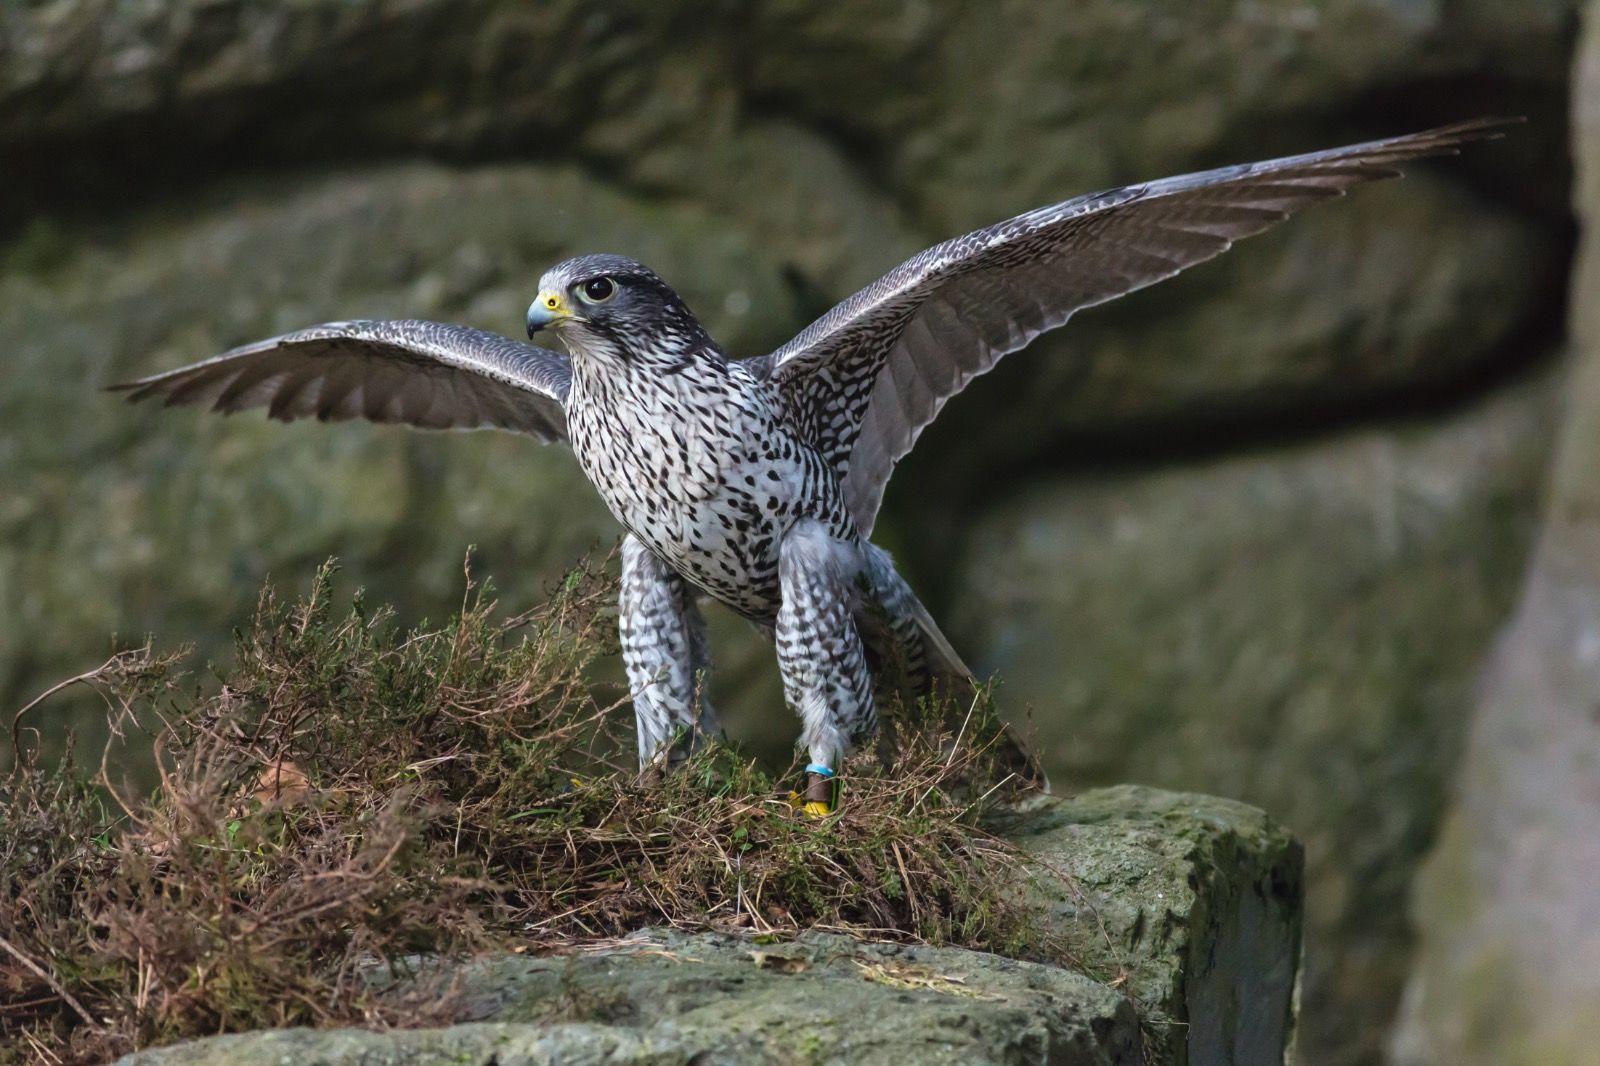 Peragrin Falcon